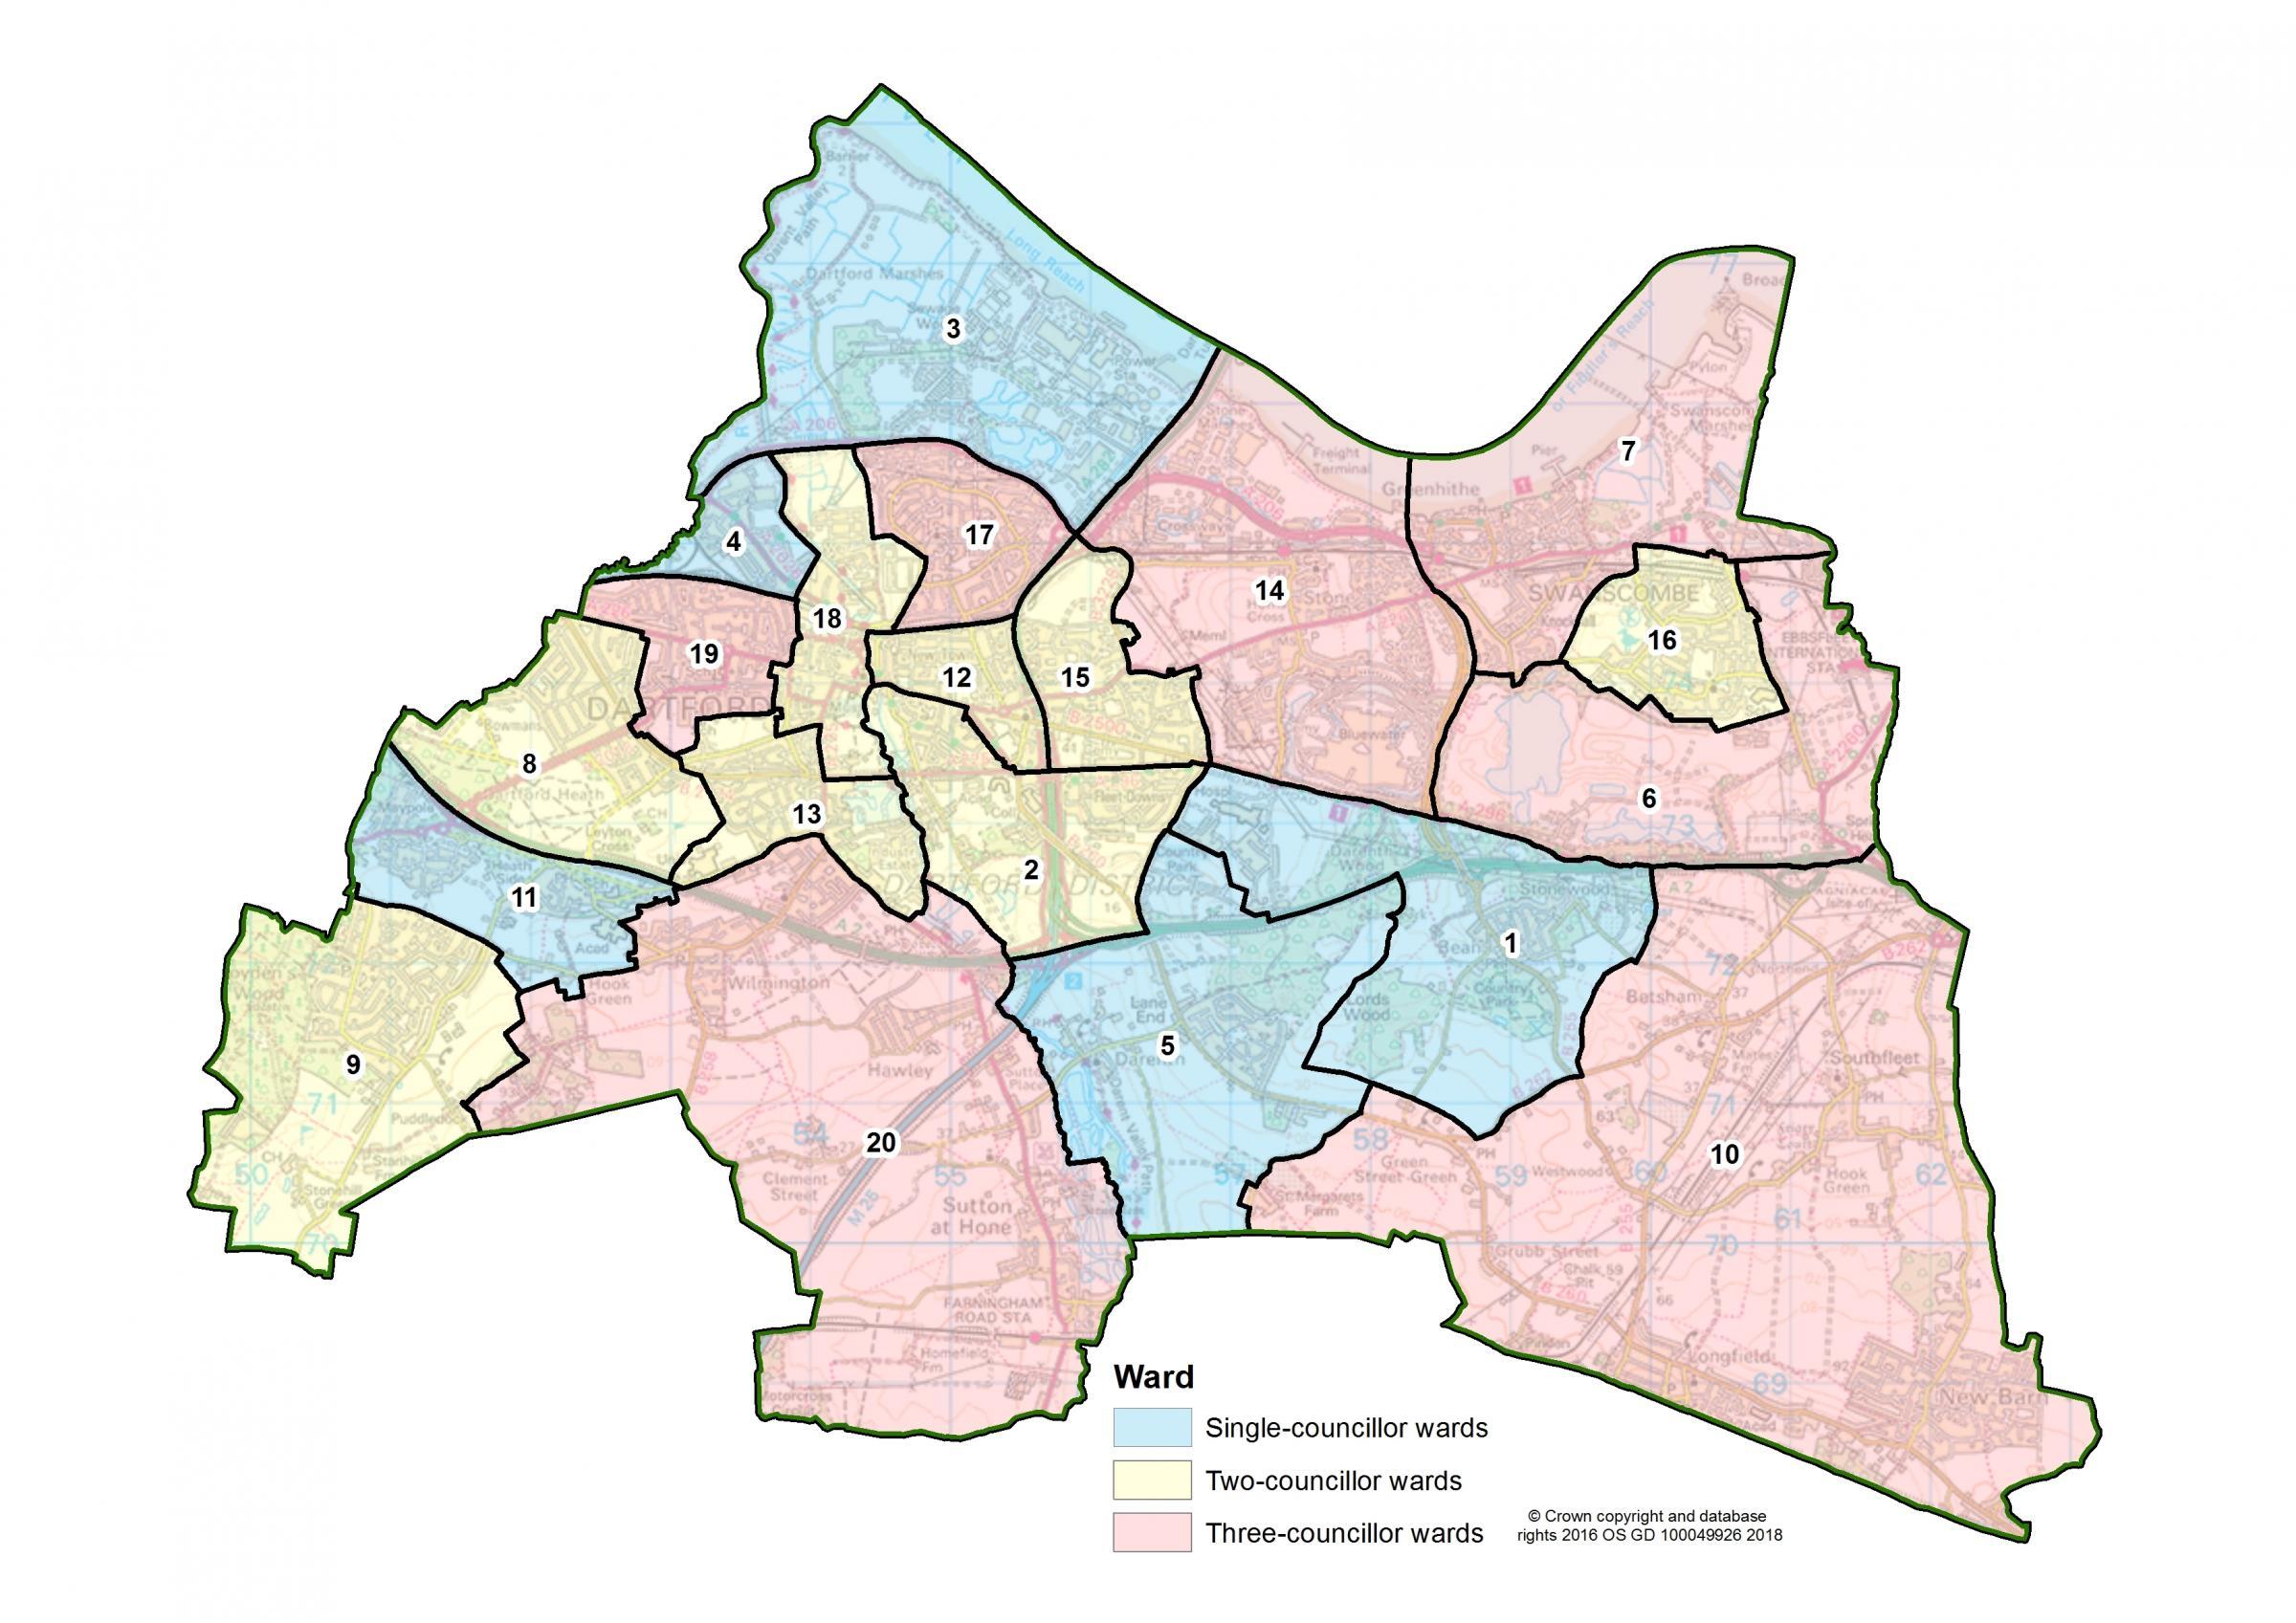 Greenwich borough boundaries in dating